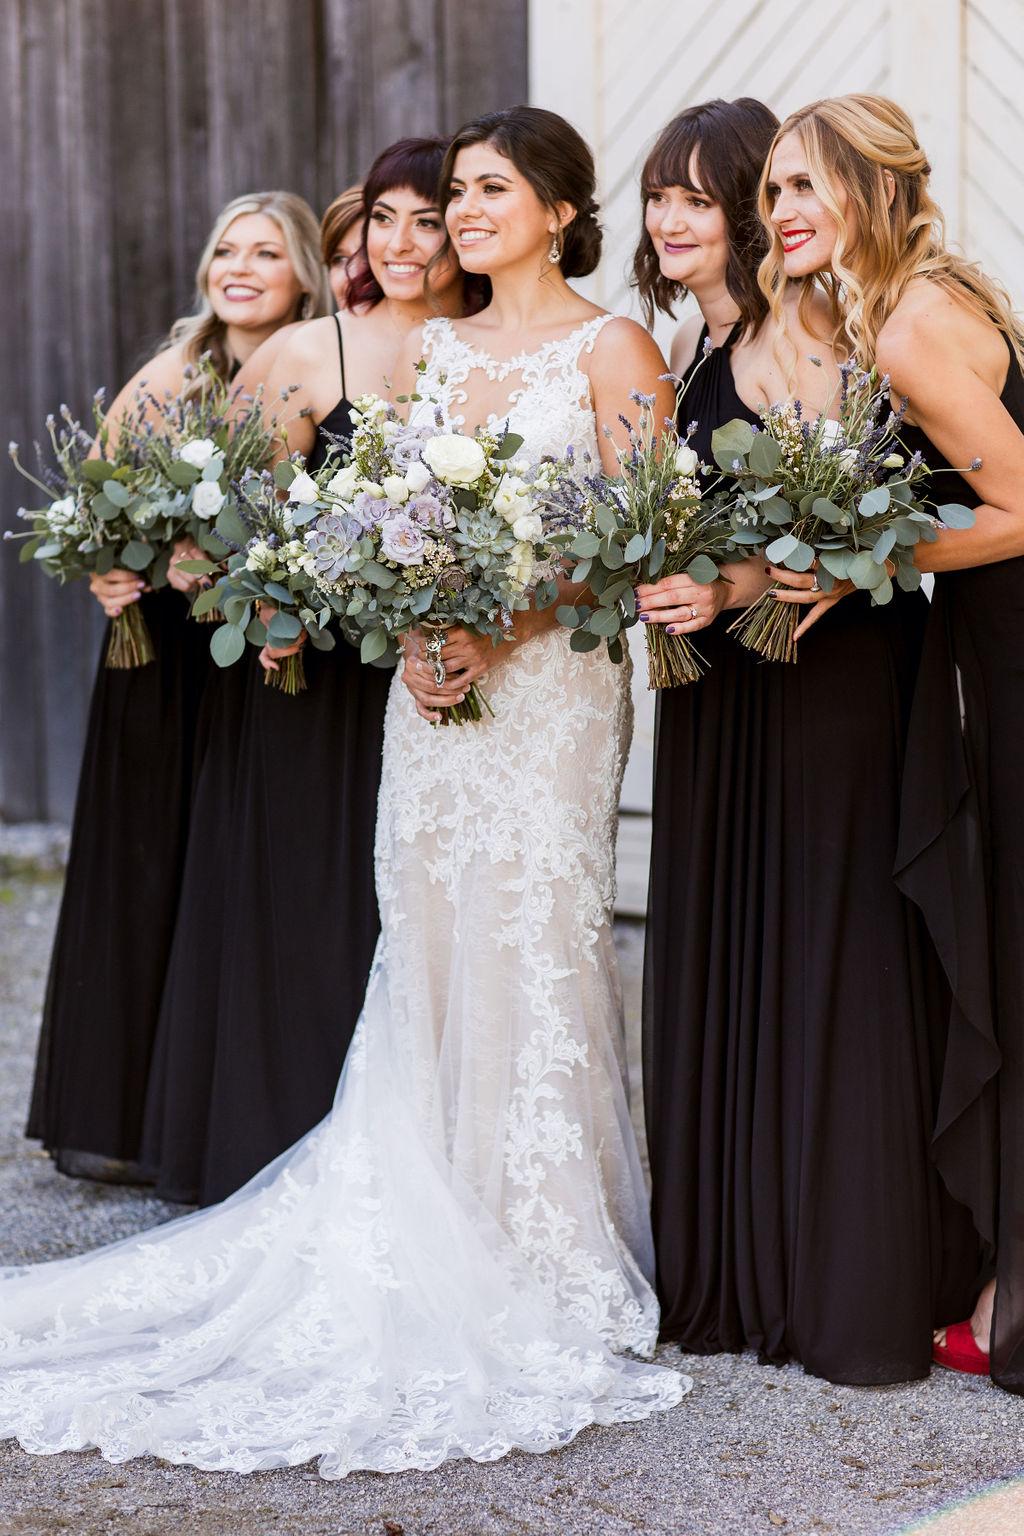 Black bridesmaid dresses | Nashville Bride Guide